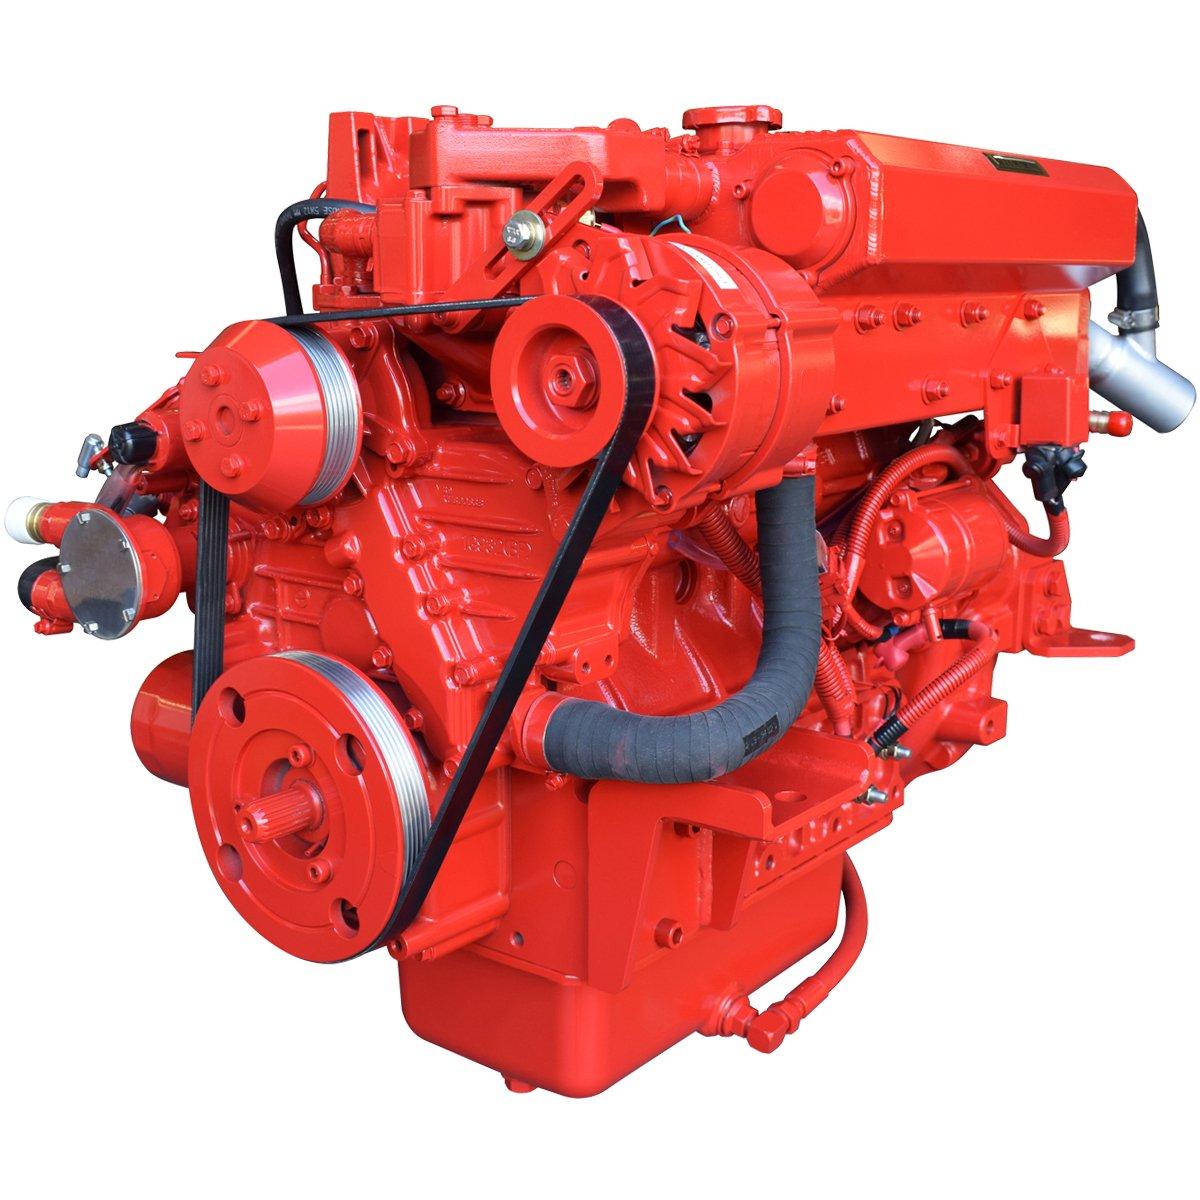 Beta Marine USA - marine diesel saildrive engines - Beta 60SD heat exchanger saildrive engine